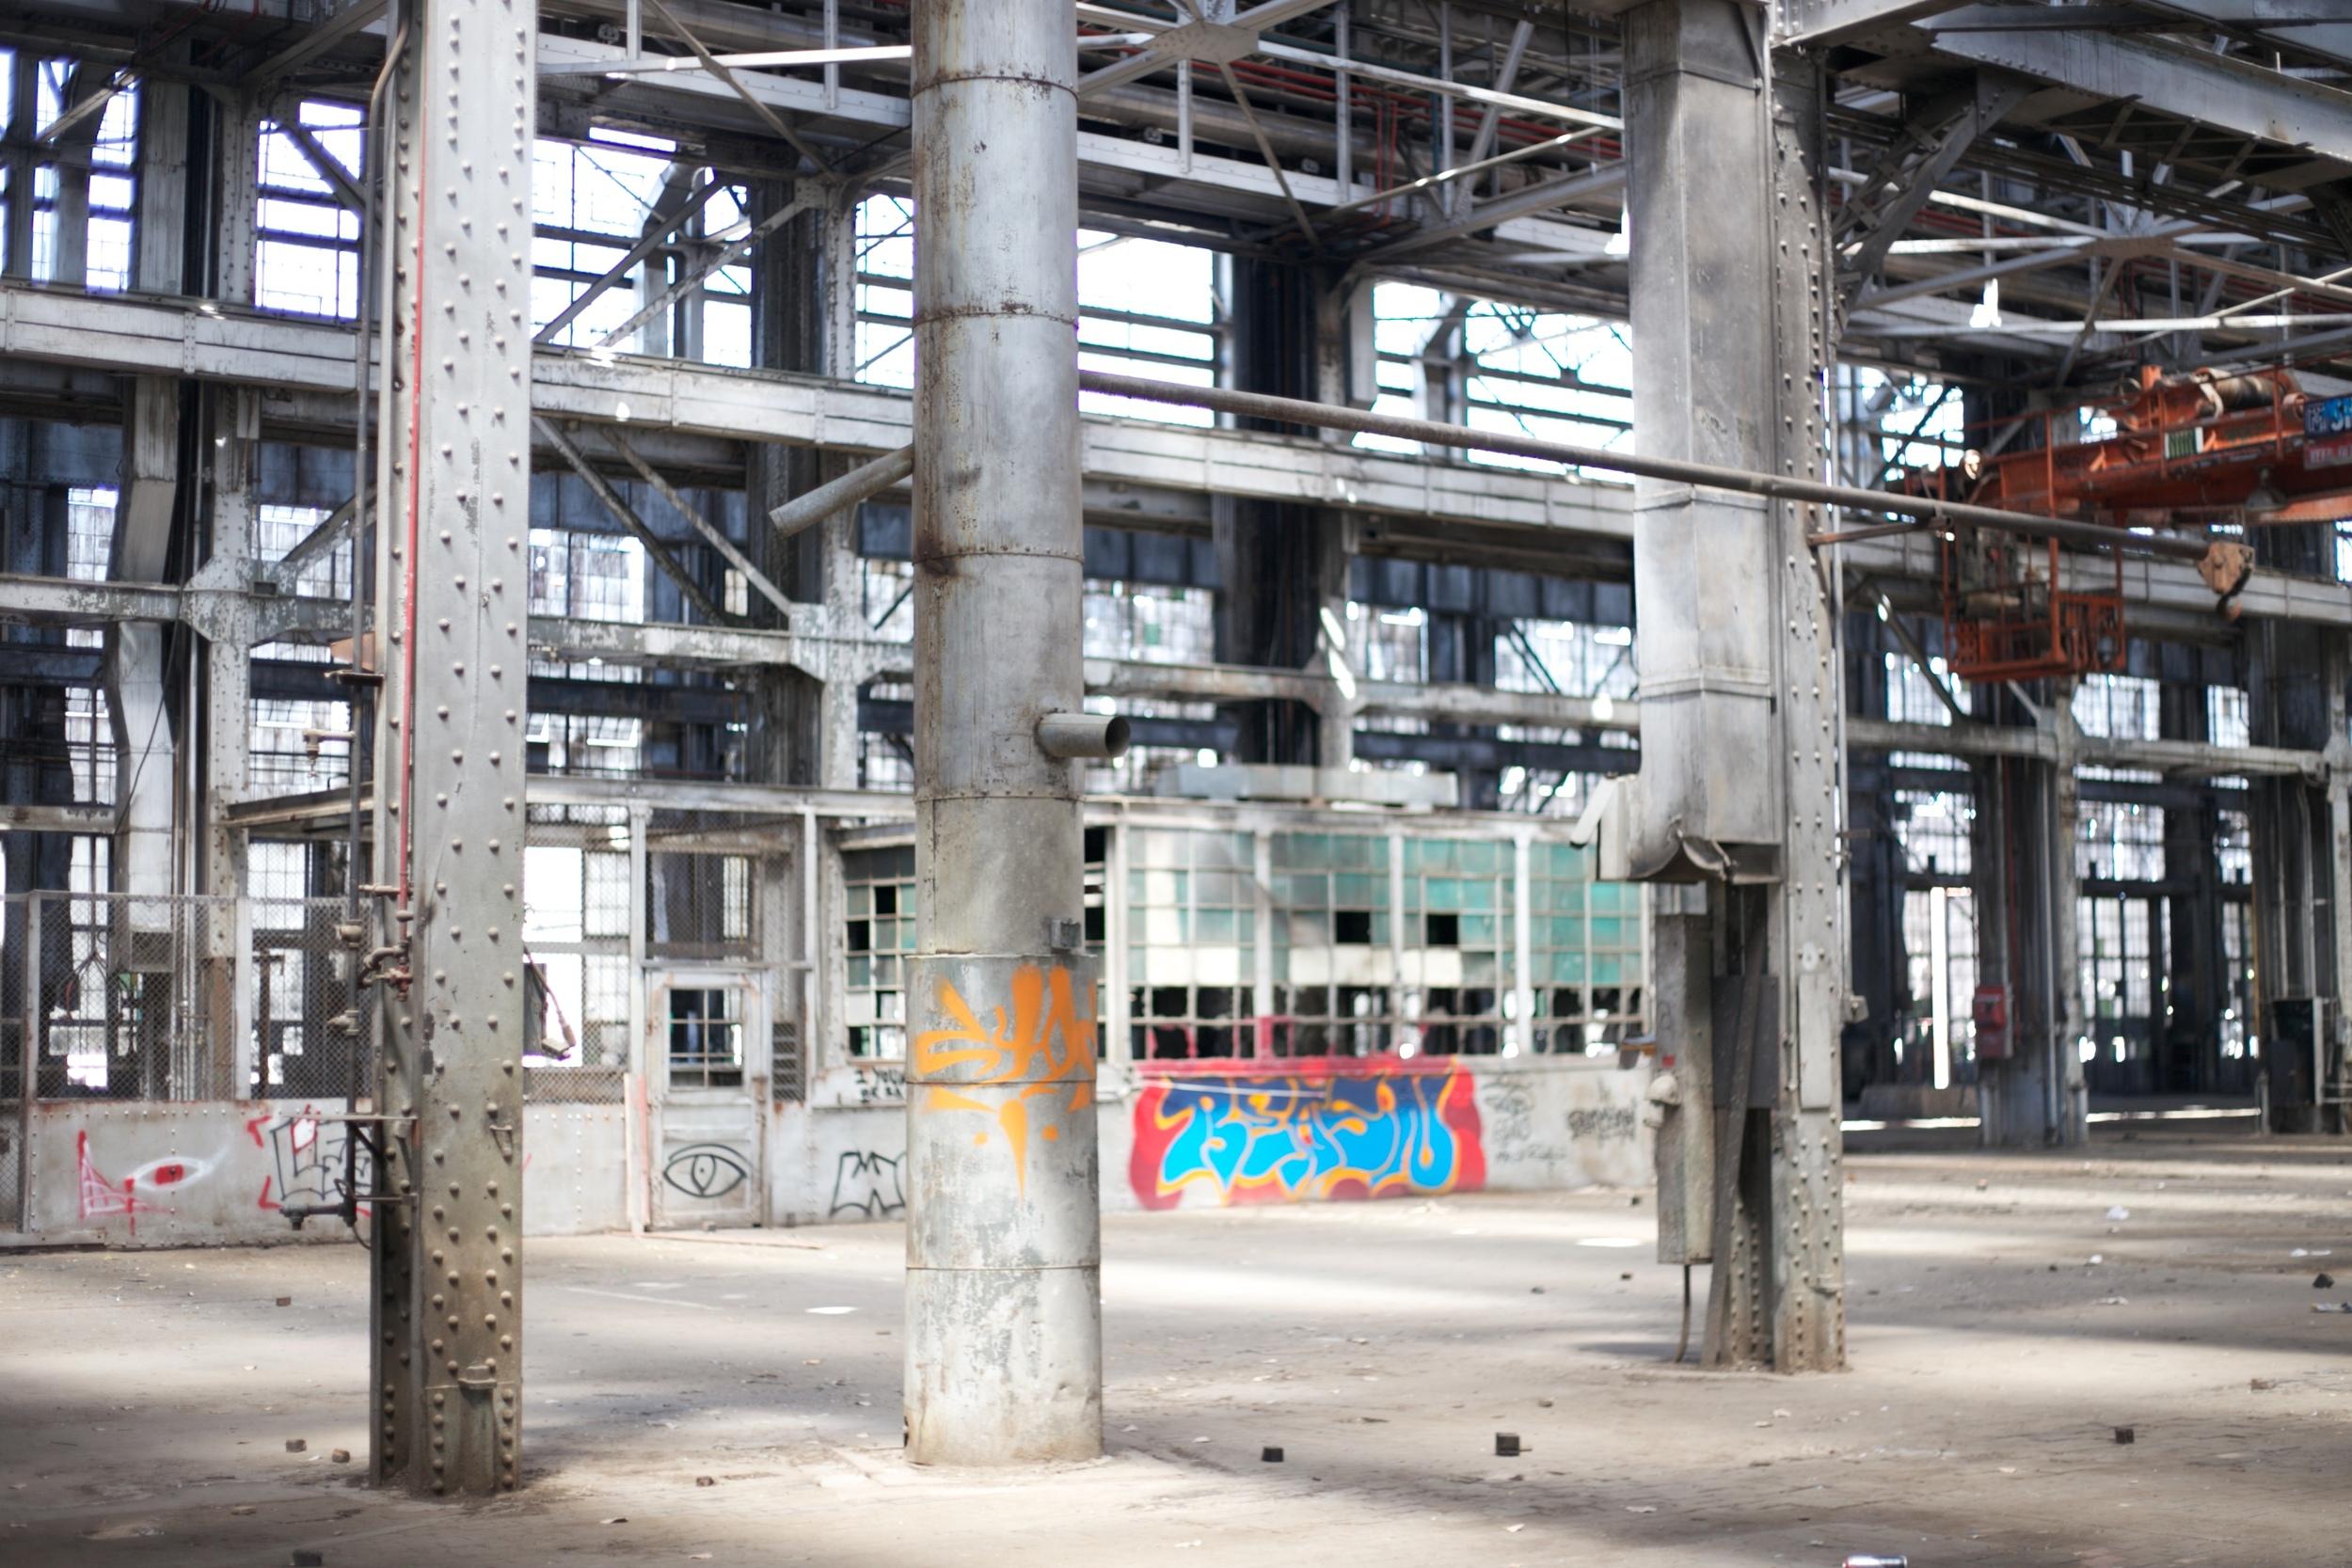 Pillars and graffiti inside the Rail Yards.